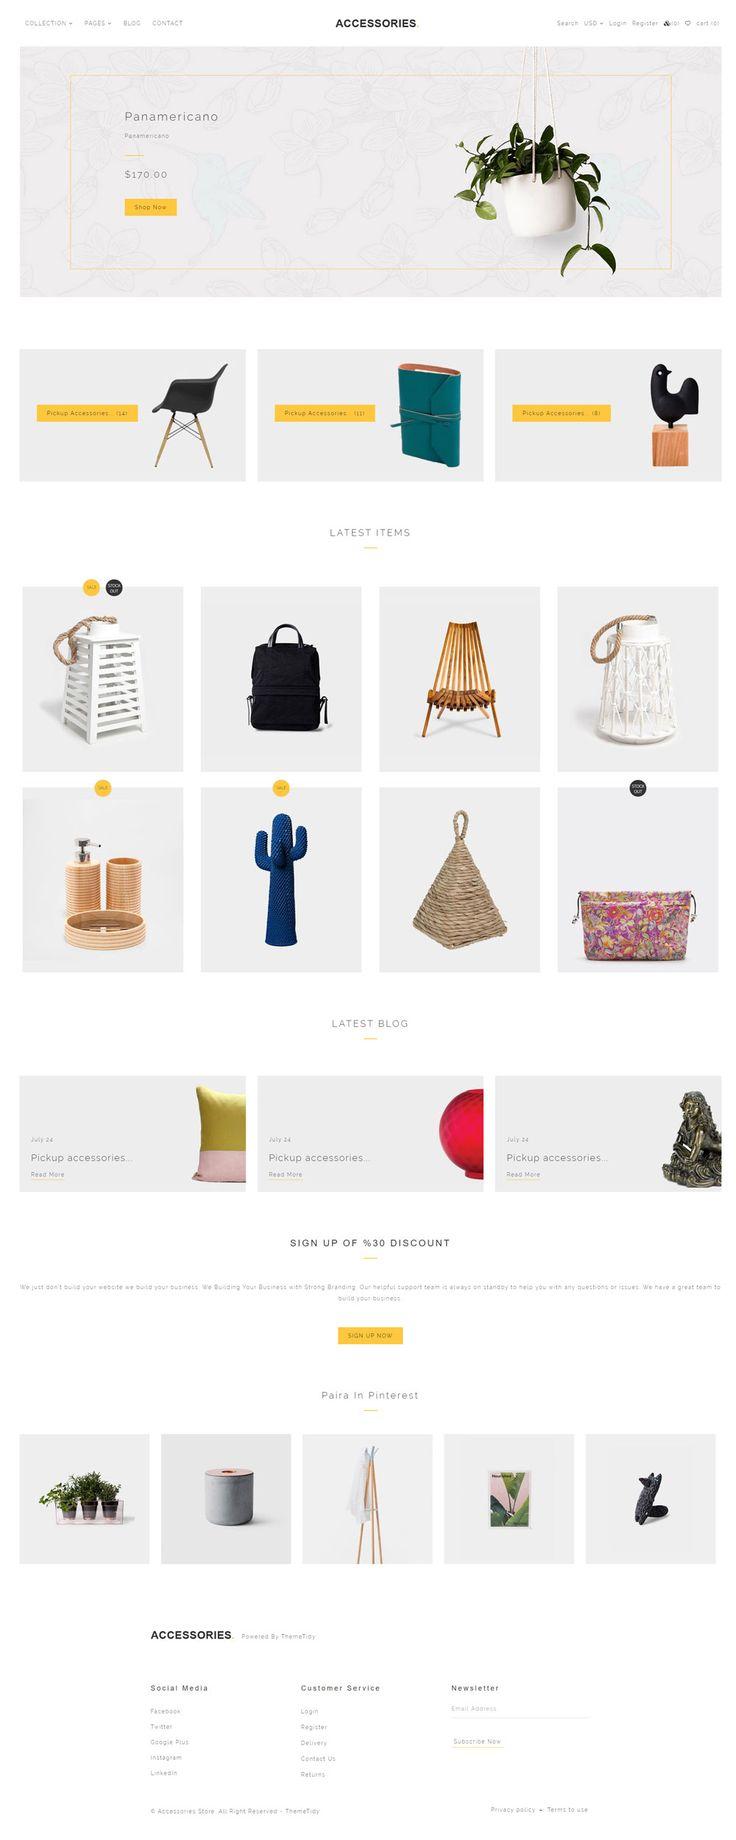 Pickup – Accessories Multipurpose Responsive eCommerce Shopify Theme Download Link: https://www.themetidy.com/item/pickup-accessories-multipurpose-responsive-ecommerce-shopify-theme/ #accessoriesshopifythemes #accessoriesshop #accessoriesstore #handmadeshop #homedecorshop #megashop #multistoreaccessories #accessoriesforwomen's #accessoriesformen's #homeaccessoriesshop #bootstrapshopifythemes #ecommerceshopifythemes #responsiveshopifythemes #responsiveshopifytemplates #parallaxshopifythemes